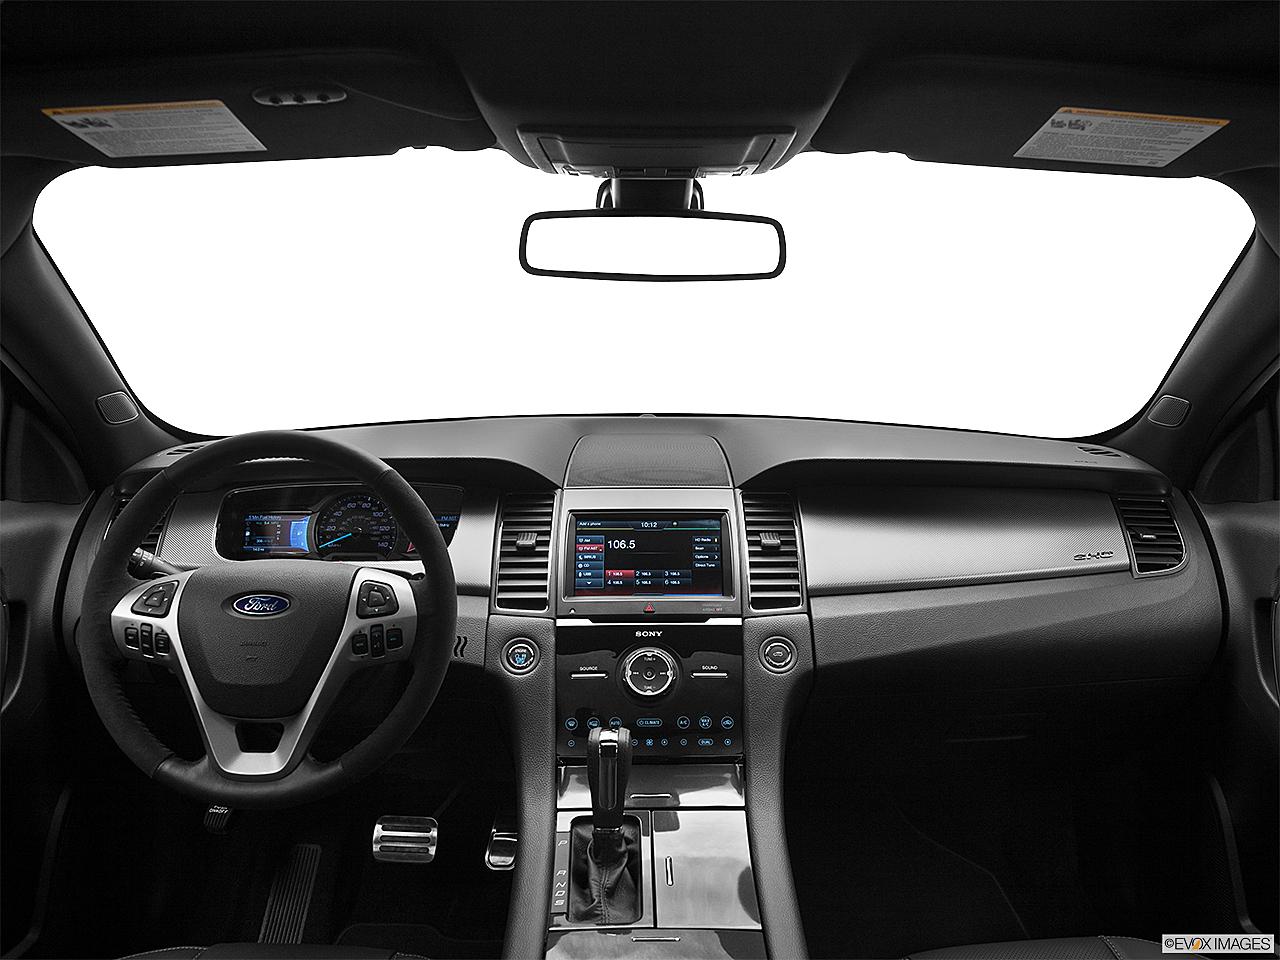 2013 Ford Taurus SHO, centered wide dash shot